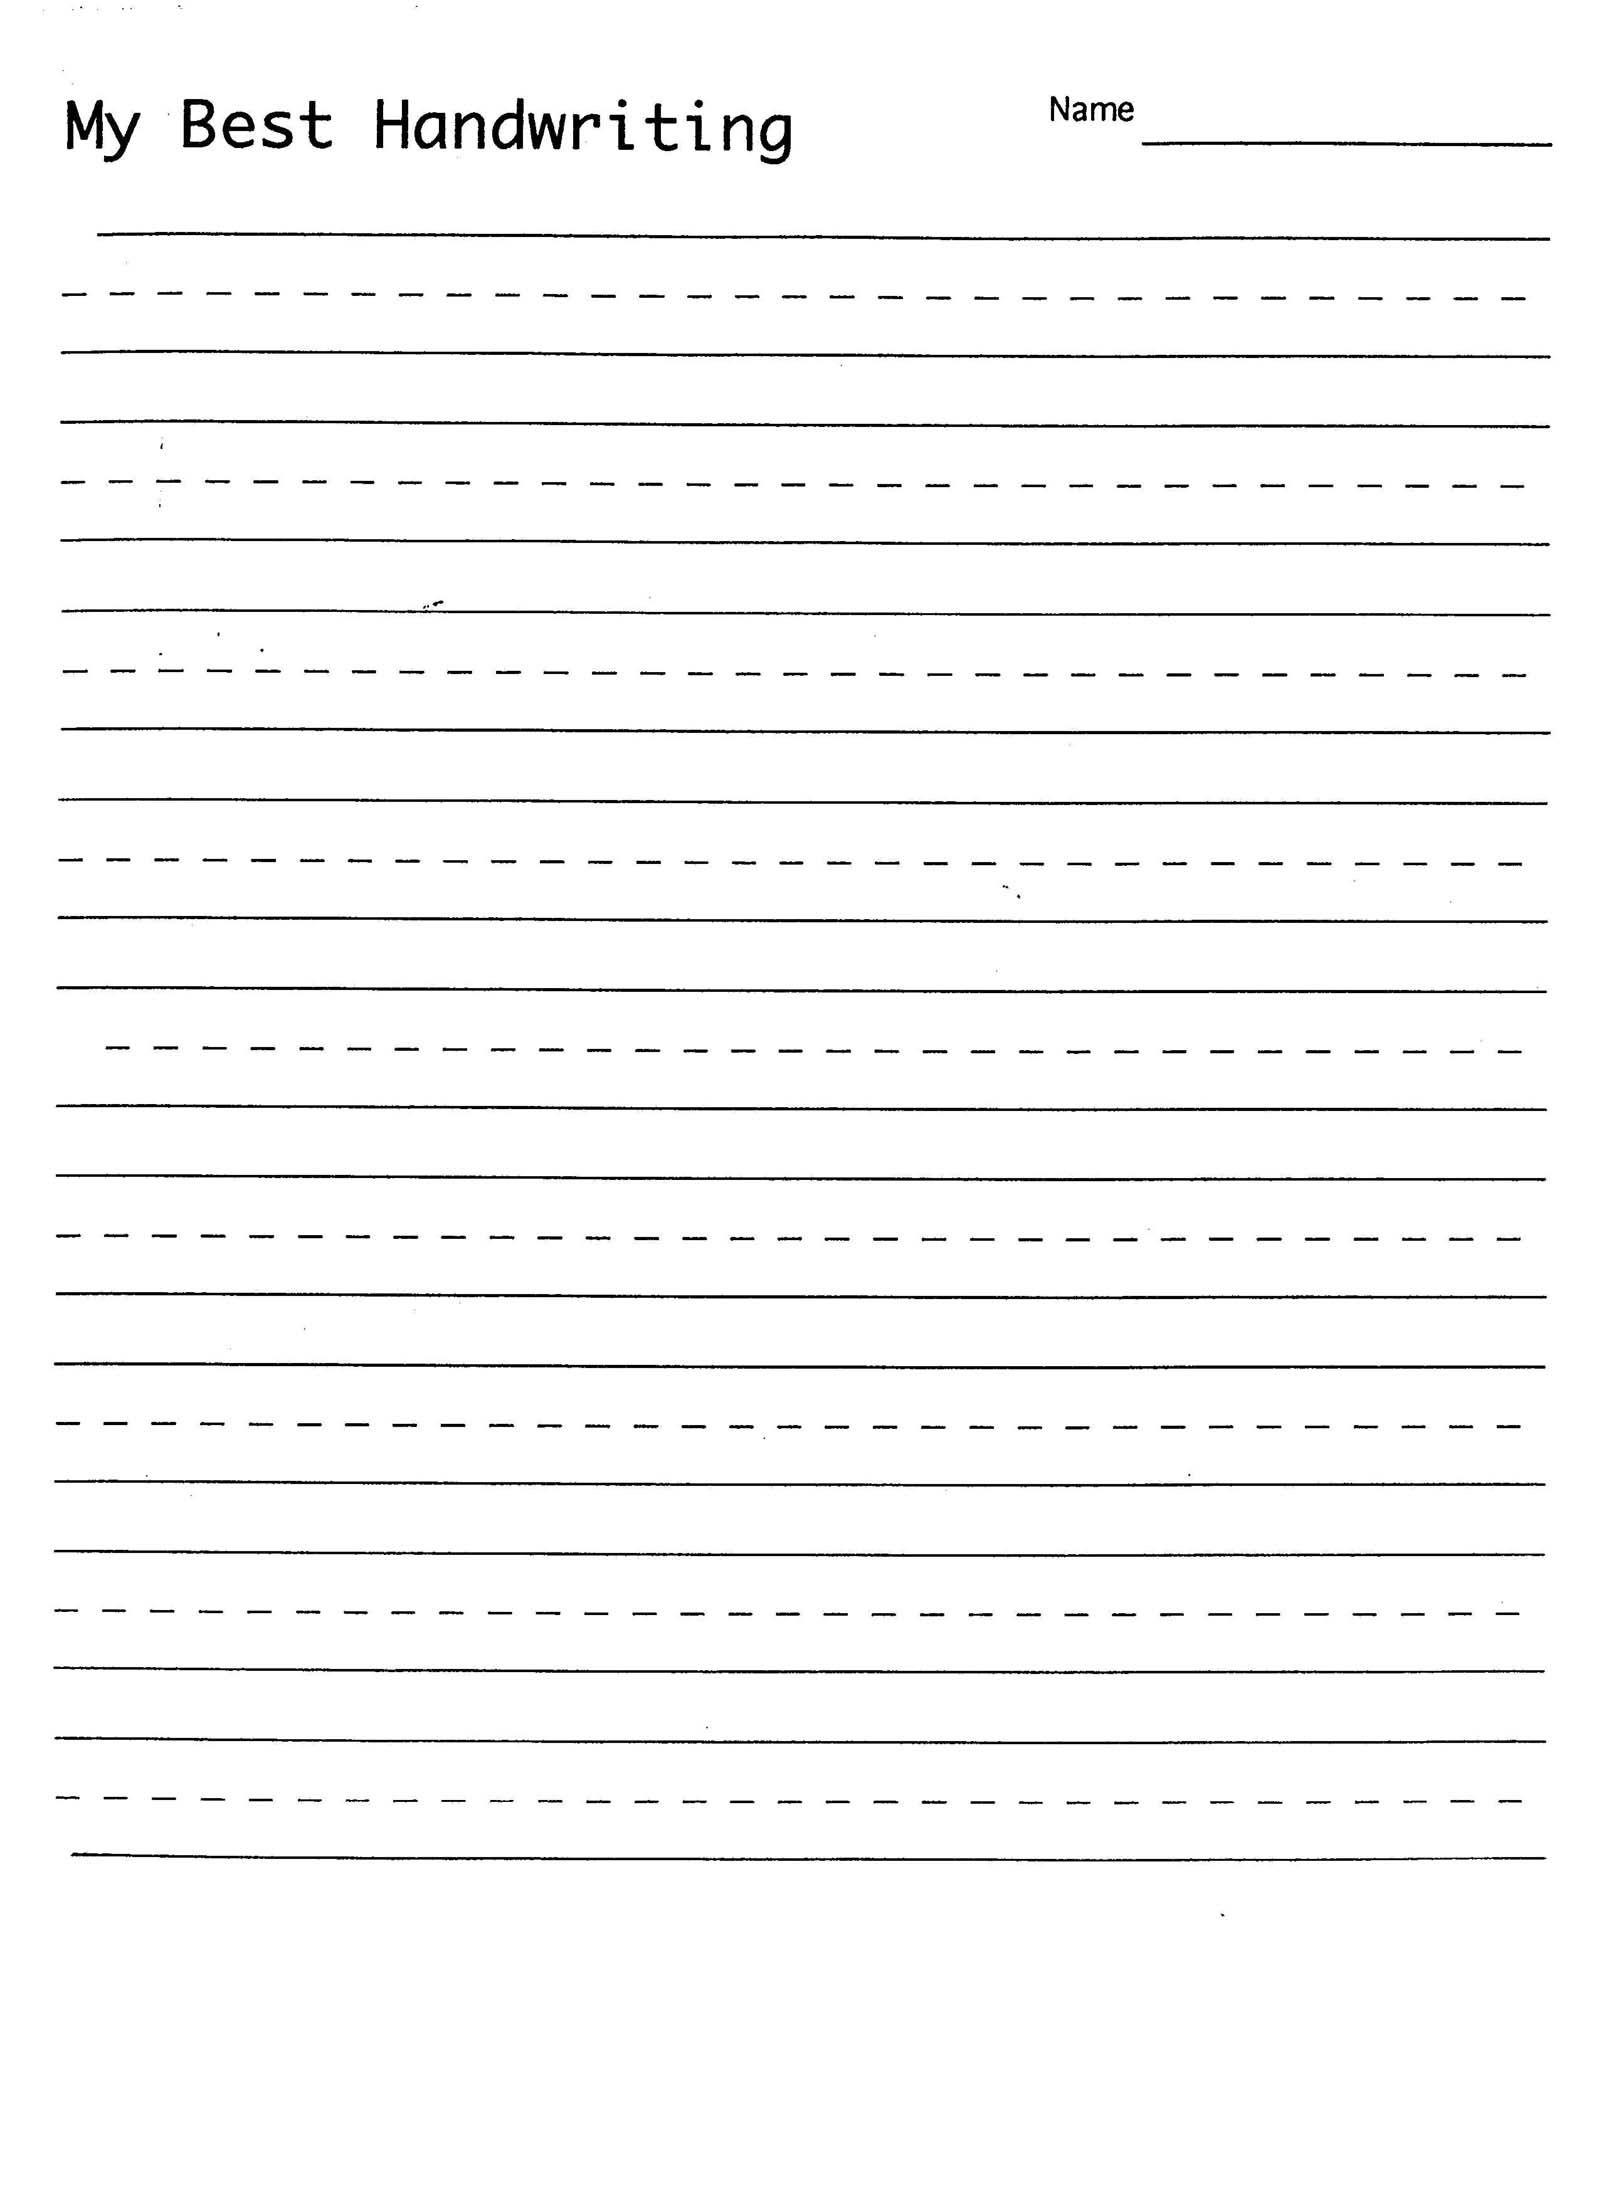 Practice Tracing Your Name - Koran.sticken.co | A To Z Teacher Stuff Tools Printable Handwriting Worksheet Generator